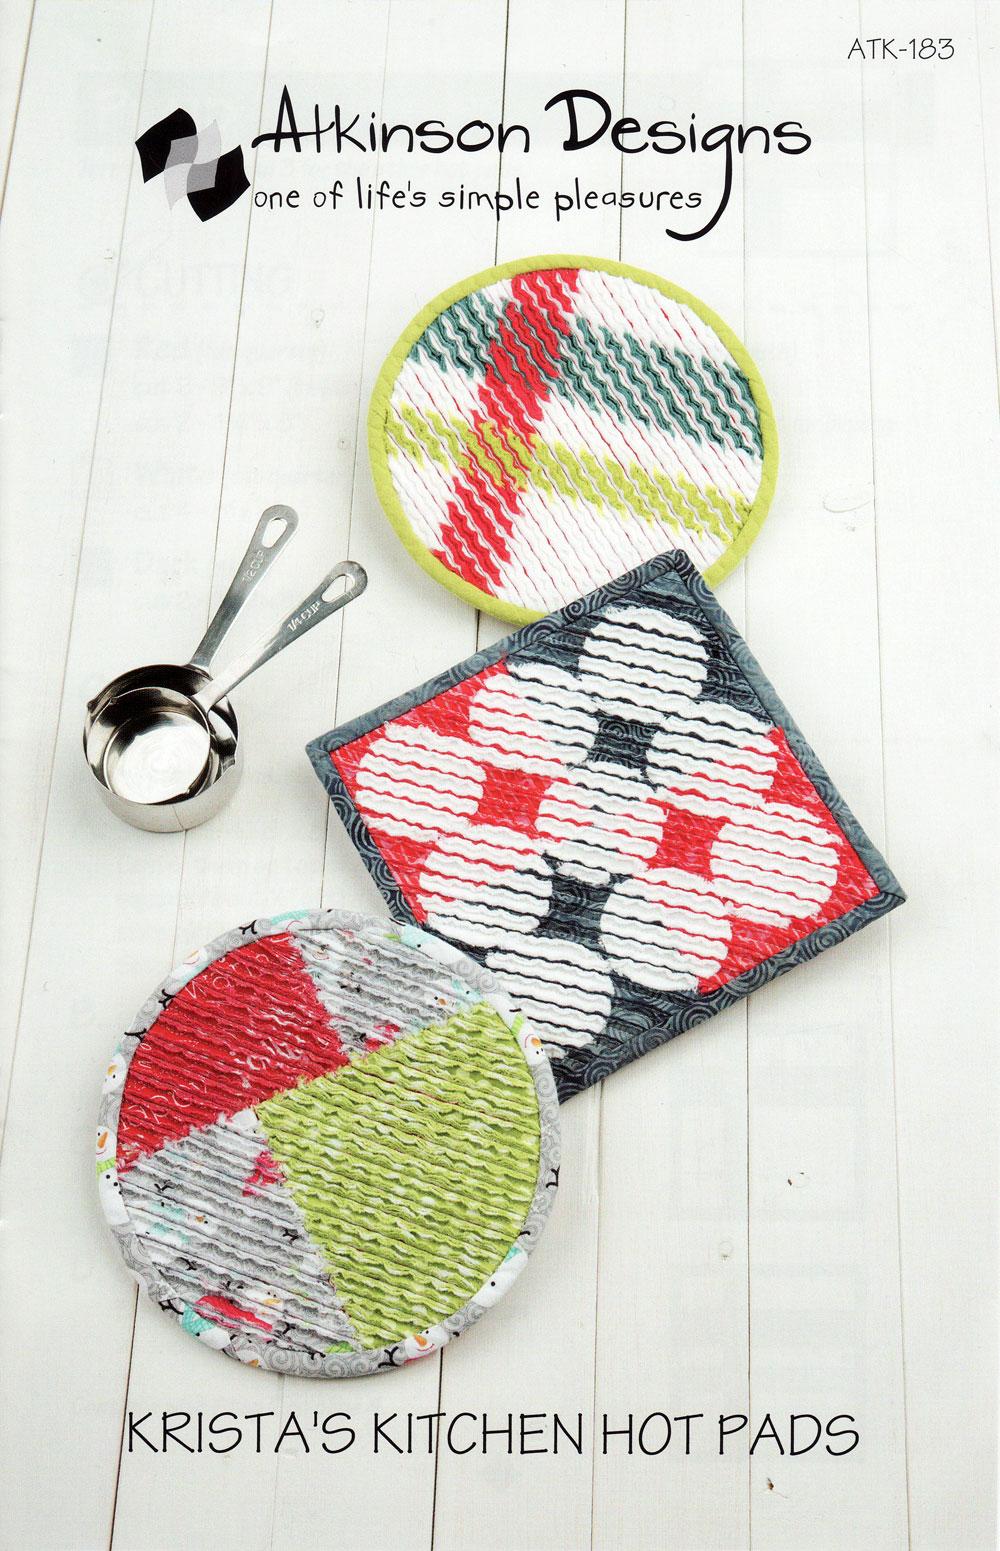 Kristas-Kitchen-Pot-Holders-sewing-pattern-Atkinson-Designs-front